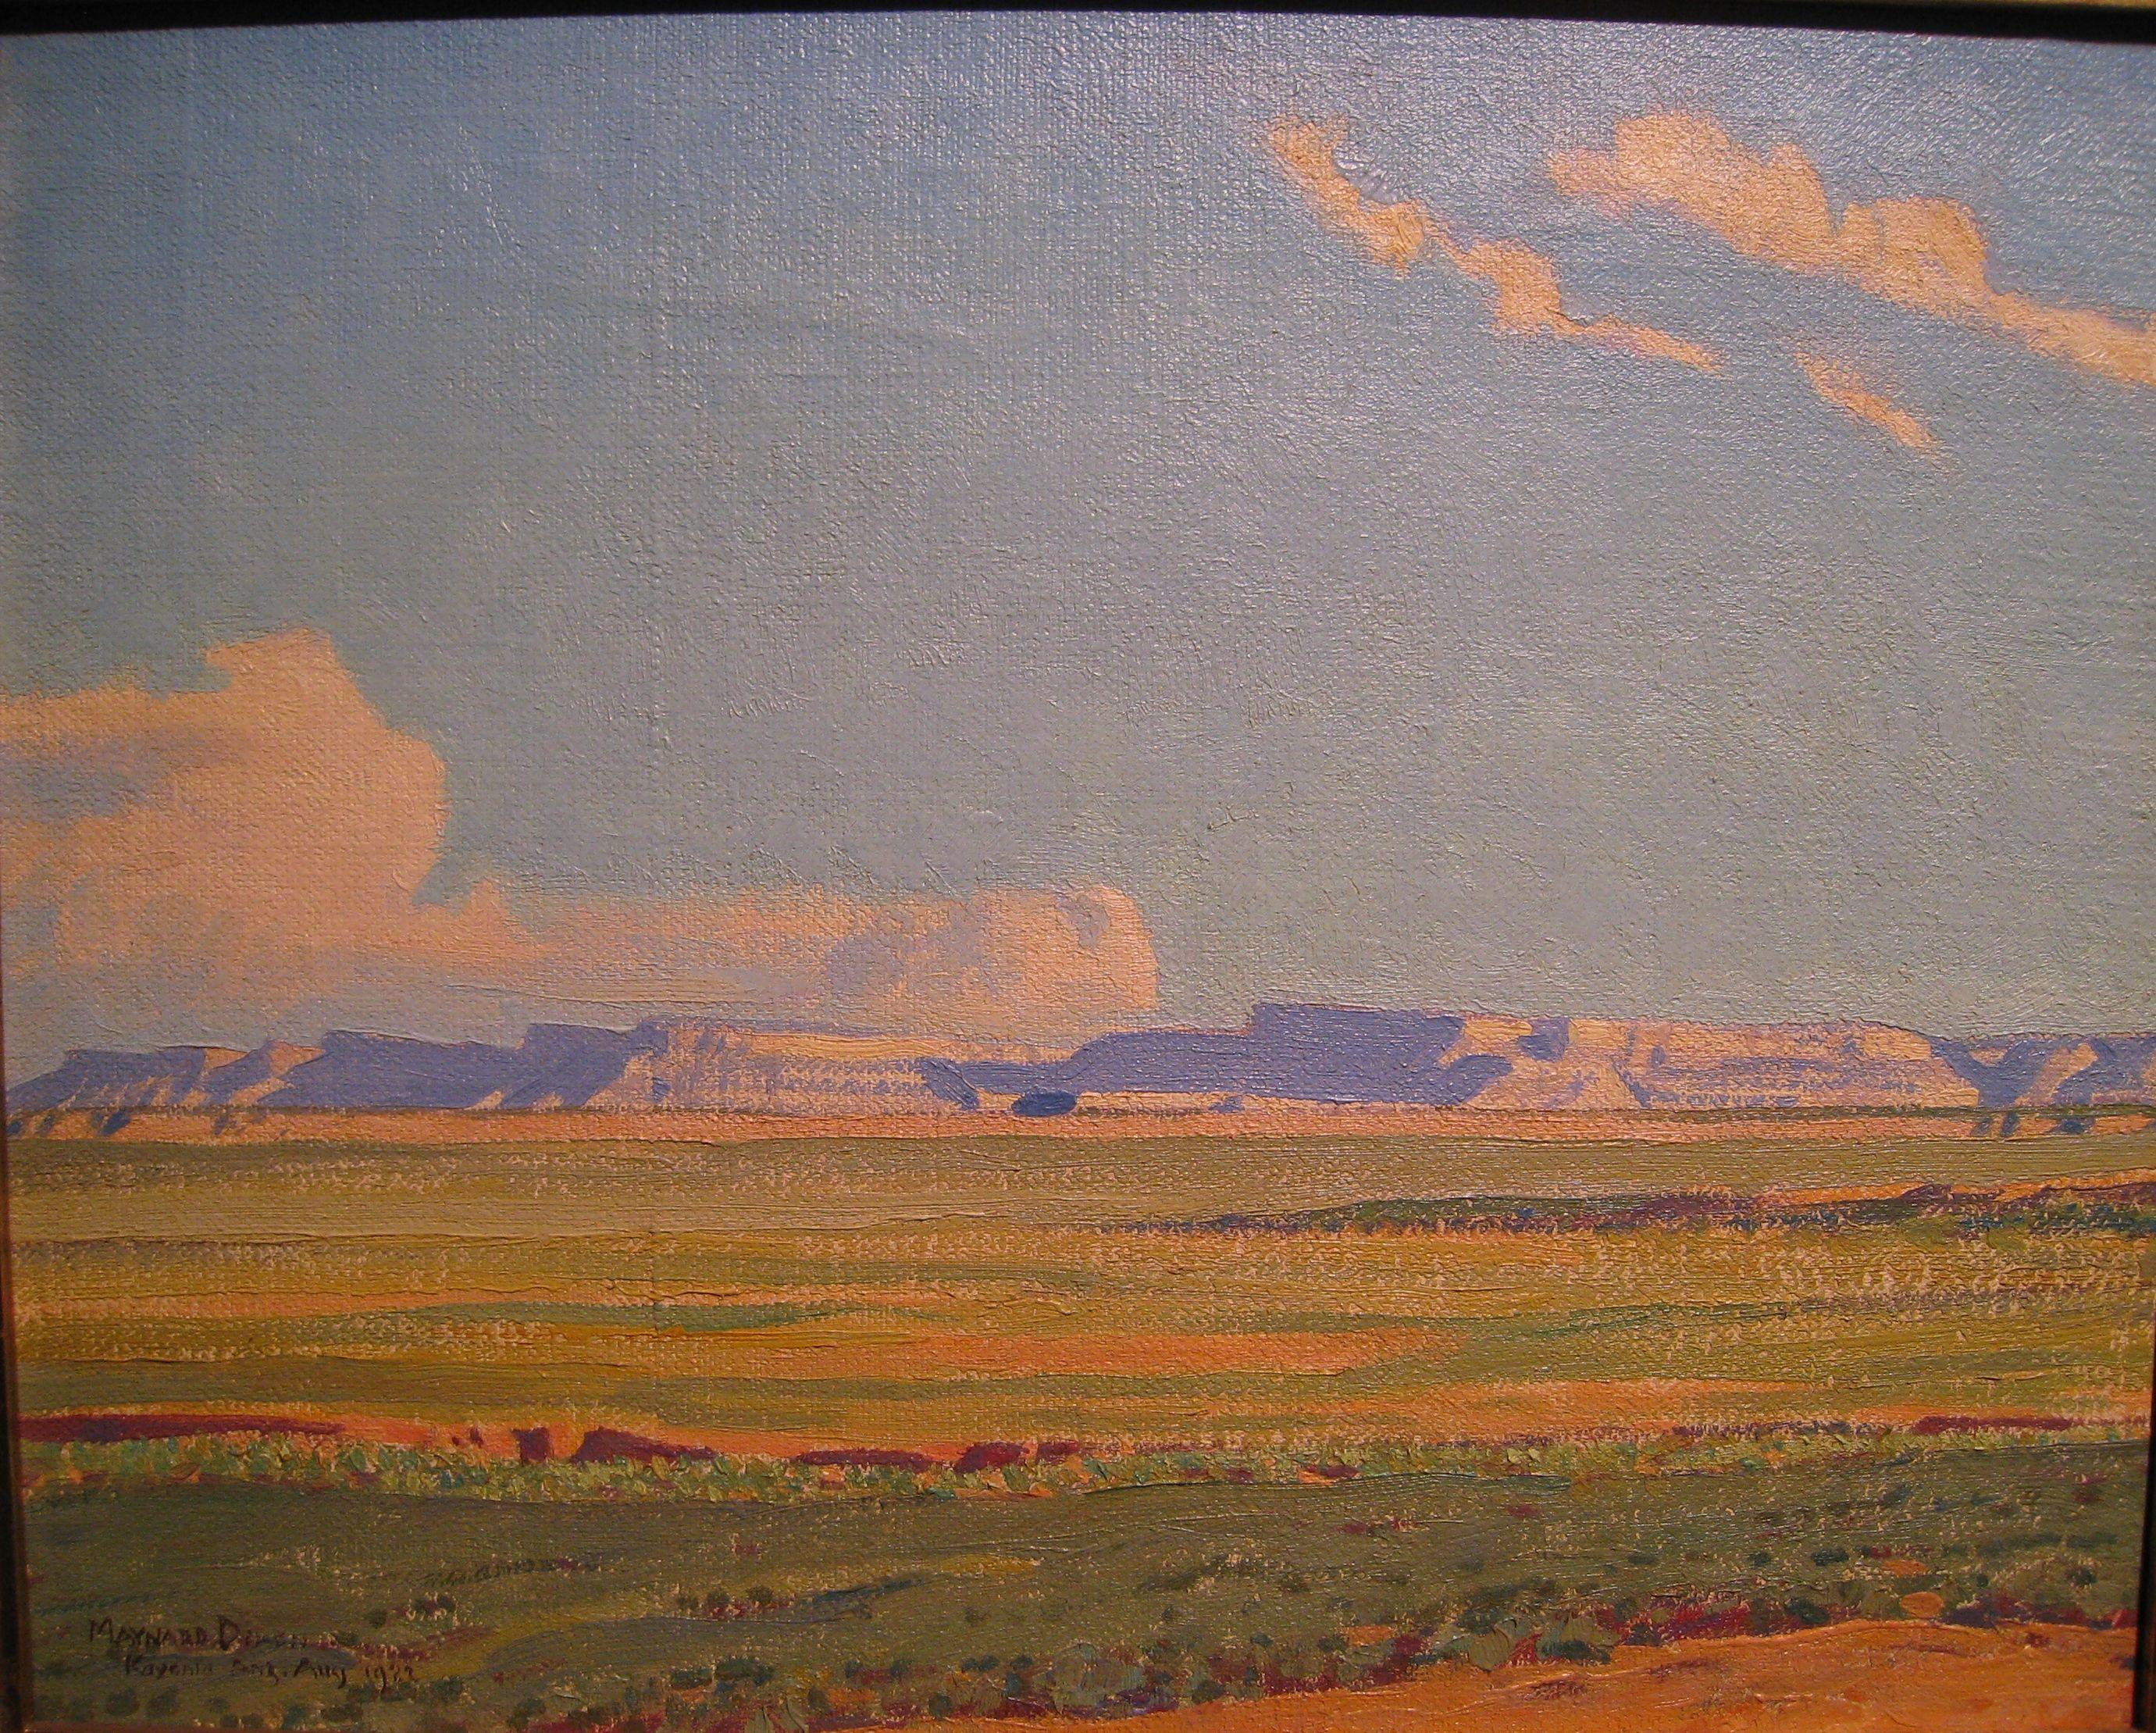 tonypetersart: Maynard Dixon oil painting at the 2013 LA Art Show.